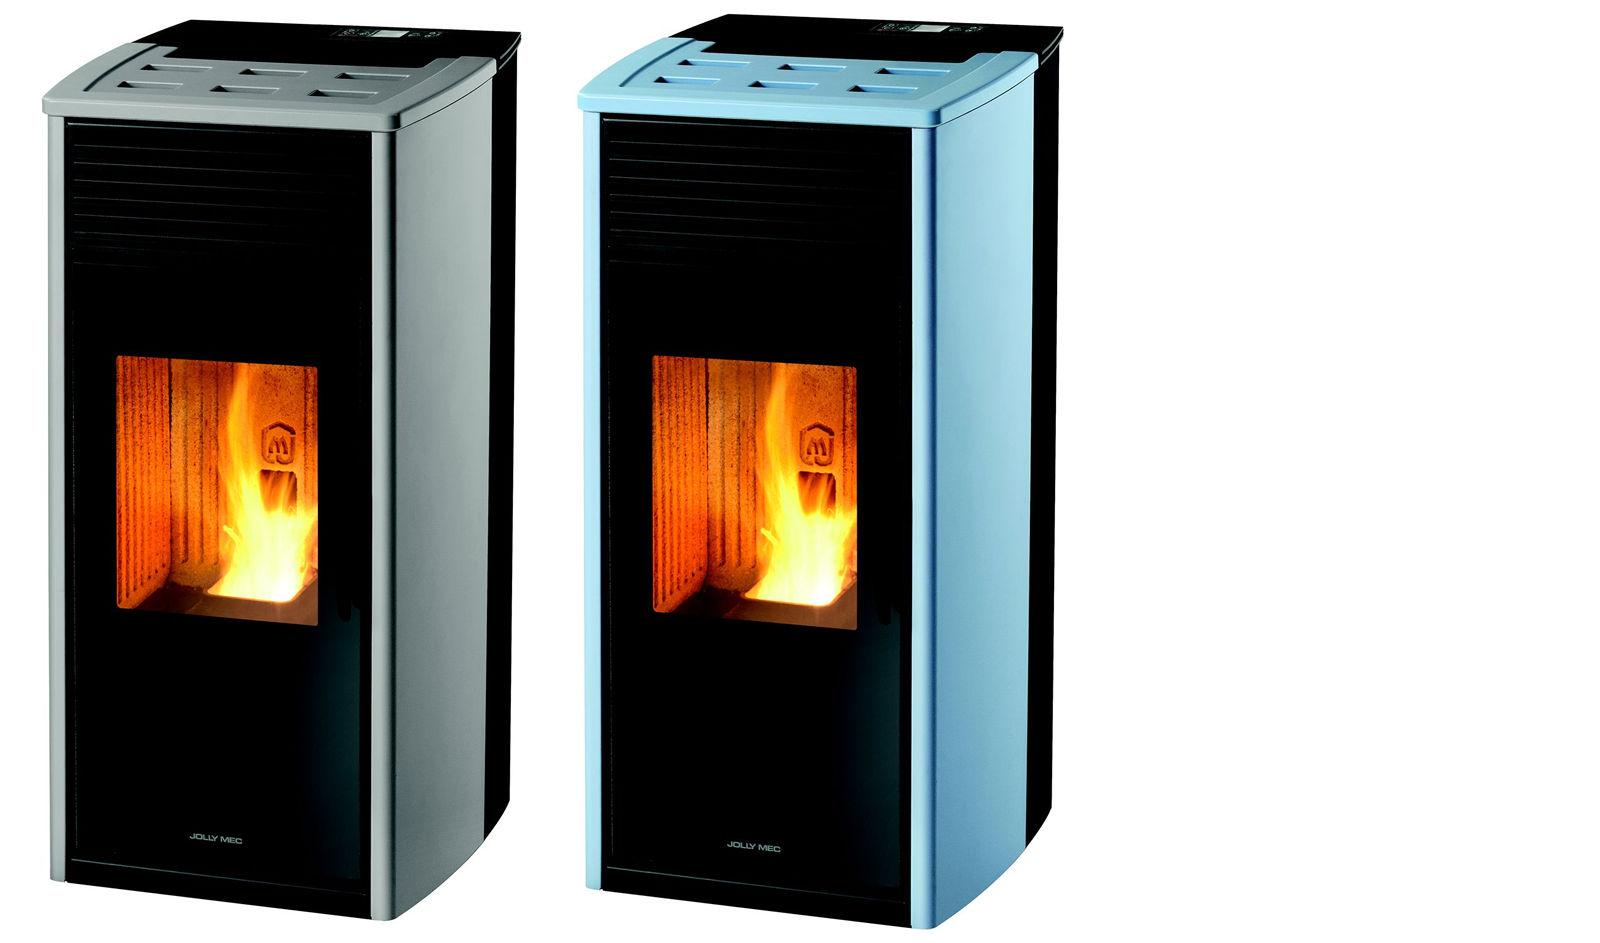 po le granul s stile pour le chauffage air forc humidifi. Black Bedroom Furniture Sets. Home Design Ideas